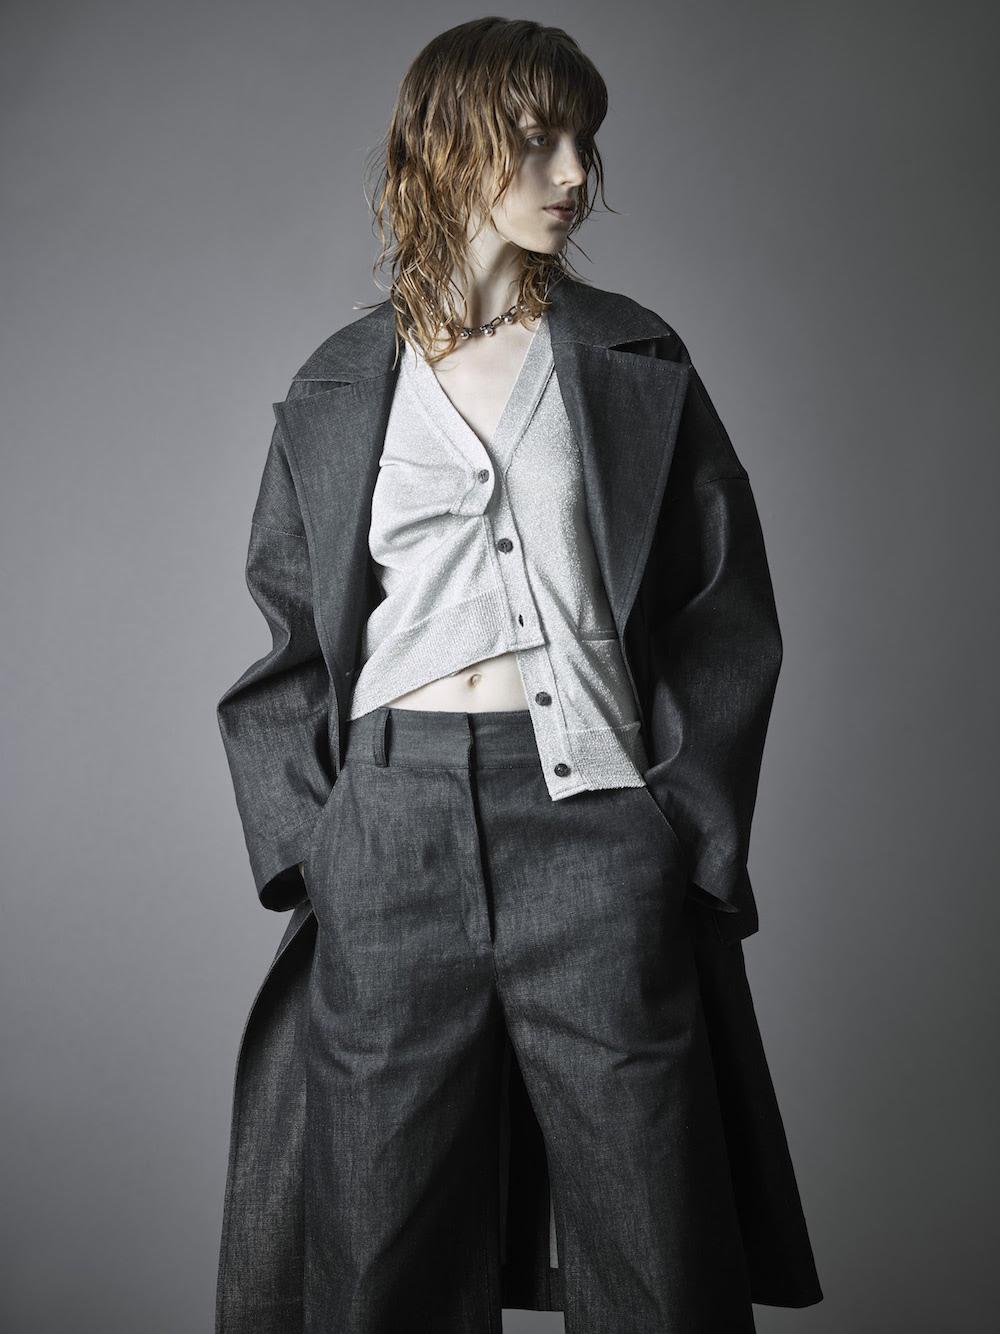 model wear 20,000,000 fragments genderless clothing 2016